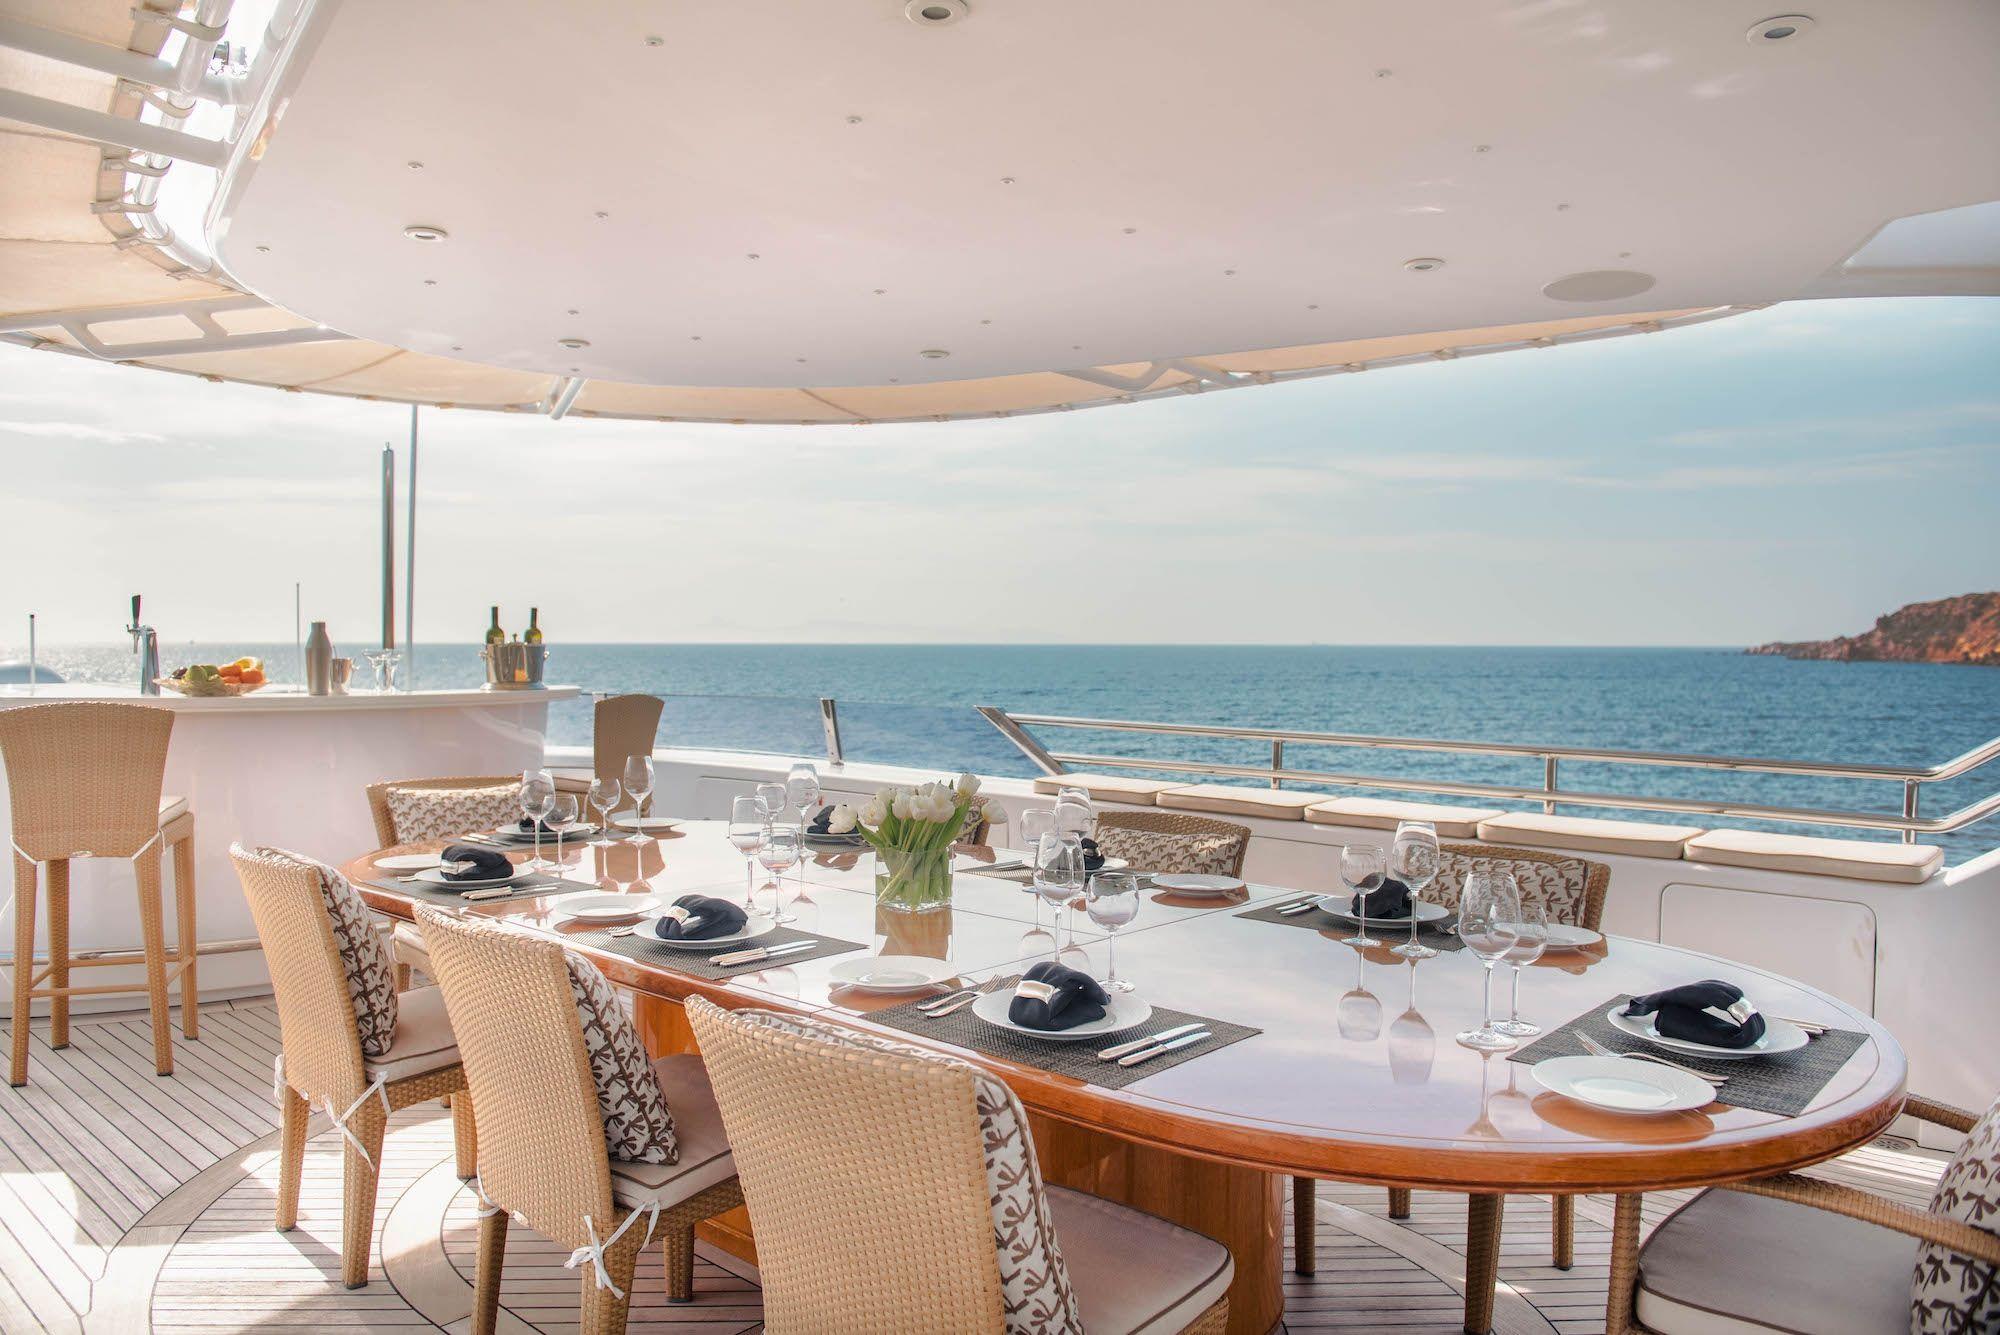 ISA Motor Yacht OASIS Al Fresco Dining